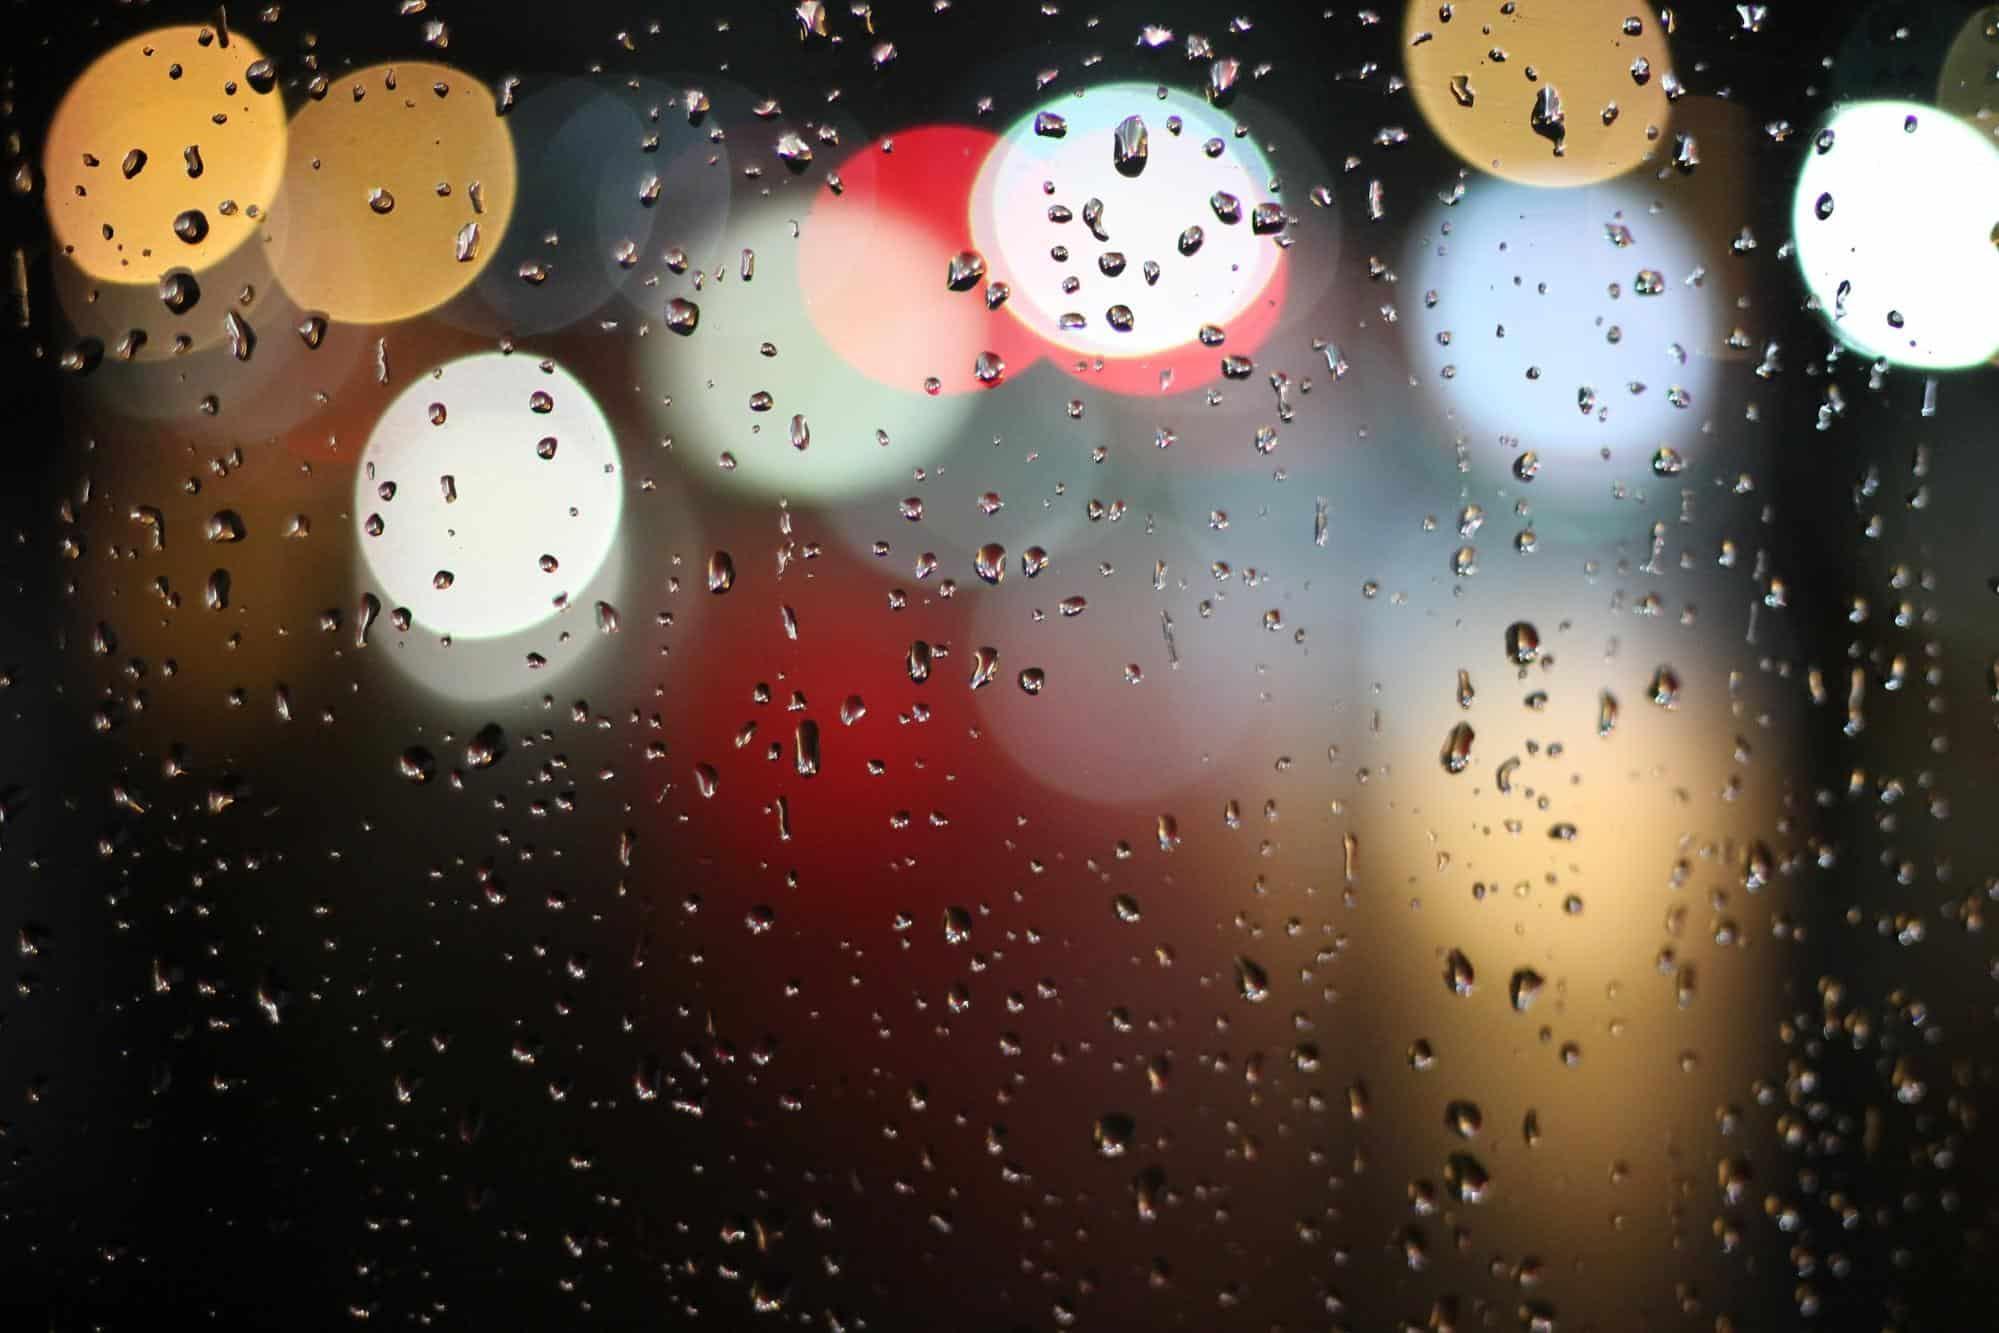 raining on a glass window